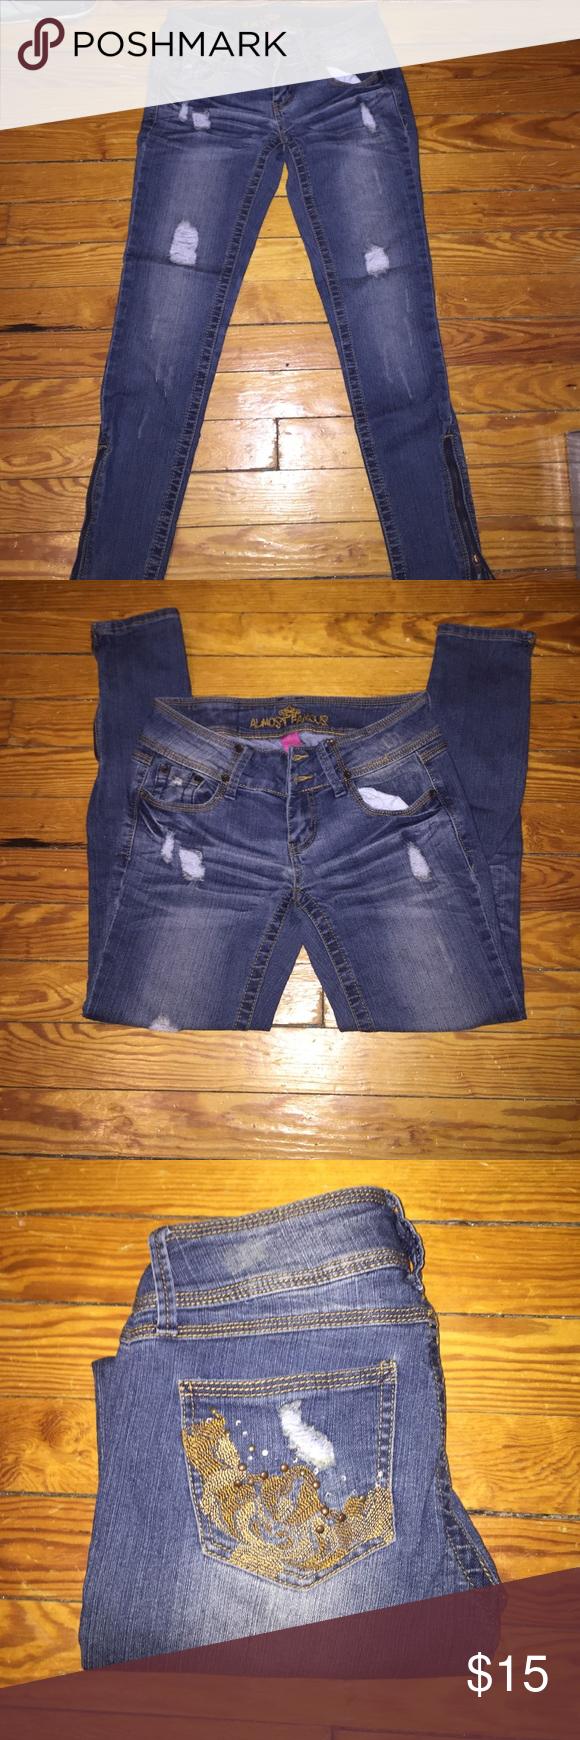 "Distressed denim jeans Distressed denim skinny leg  jeans size 5 - inseam 27"" Jeans Skinny"